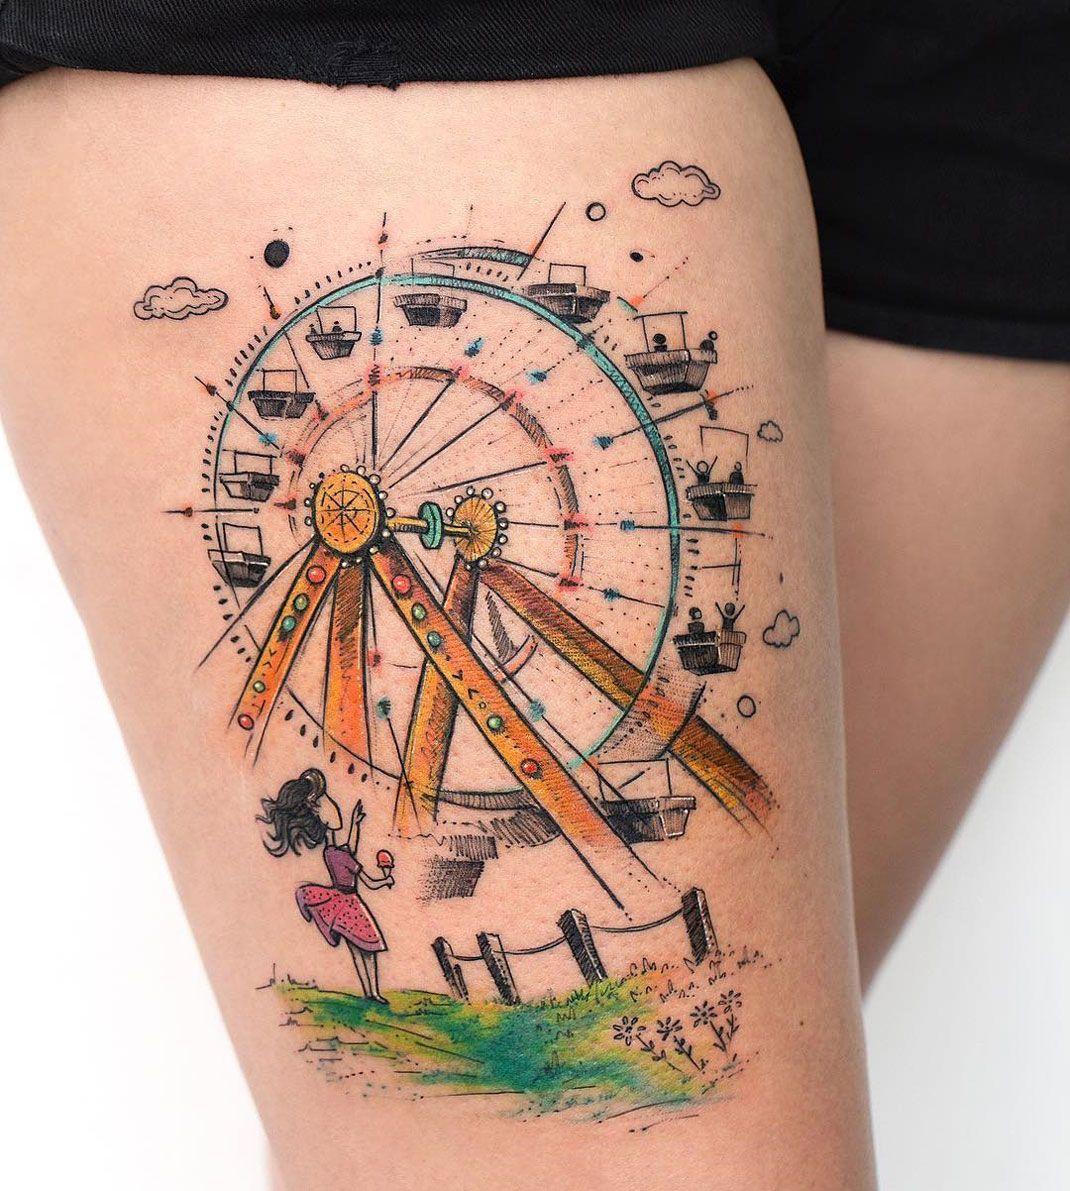 50 Ferris Wheel Tattoo Ideas For Men – Amusement Ride Designs 50 Ferris Wheel Tattoo Ideas For Men – Amusement Ride Designs new images